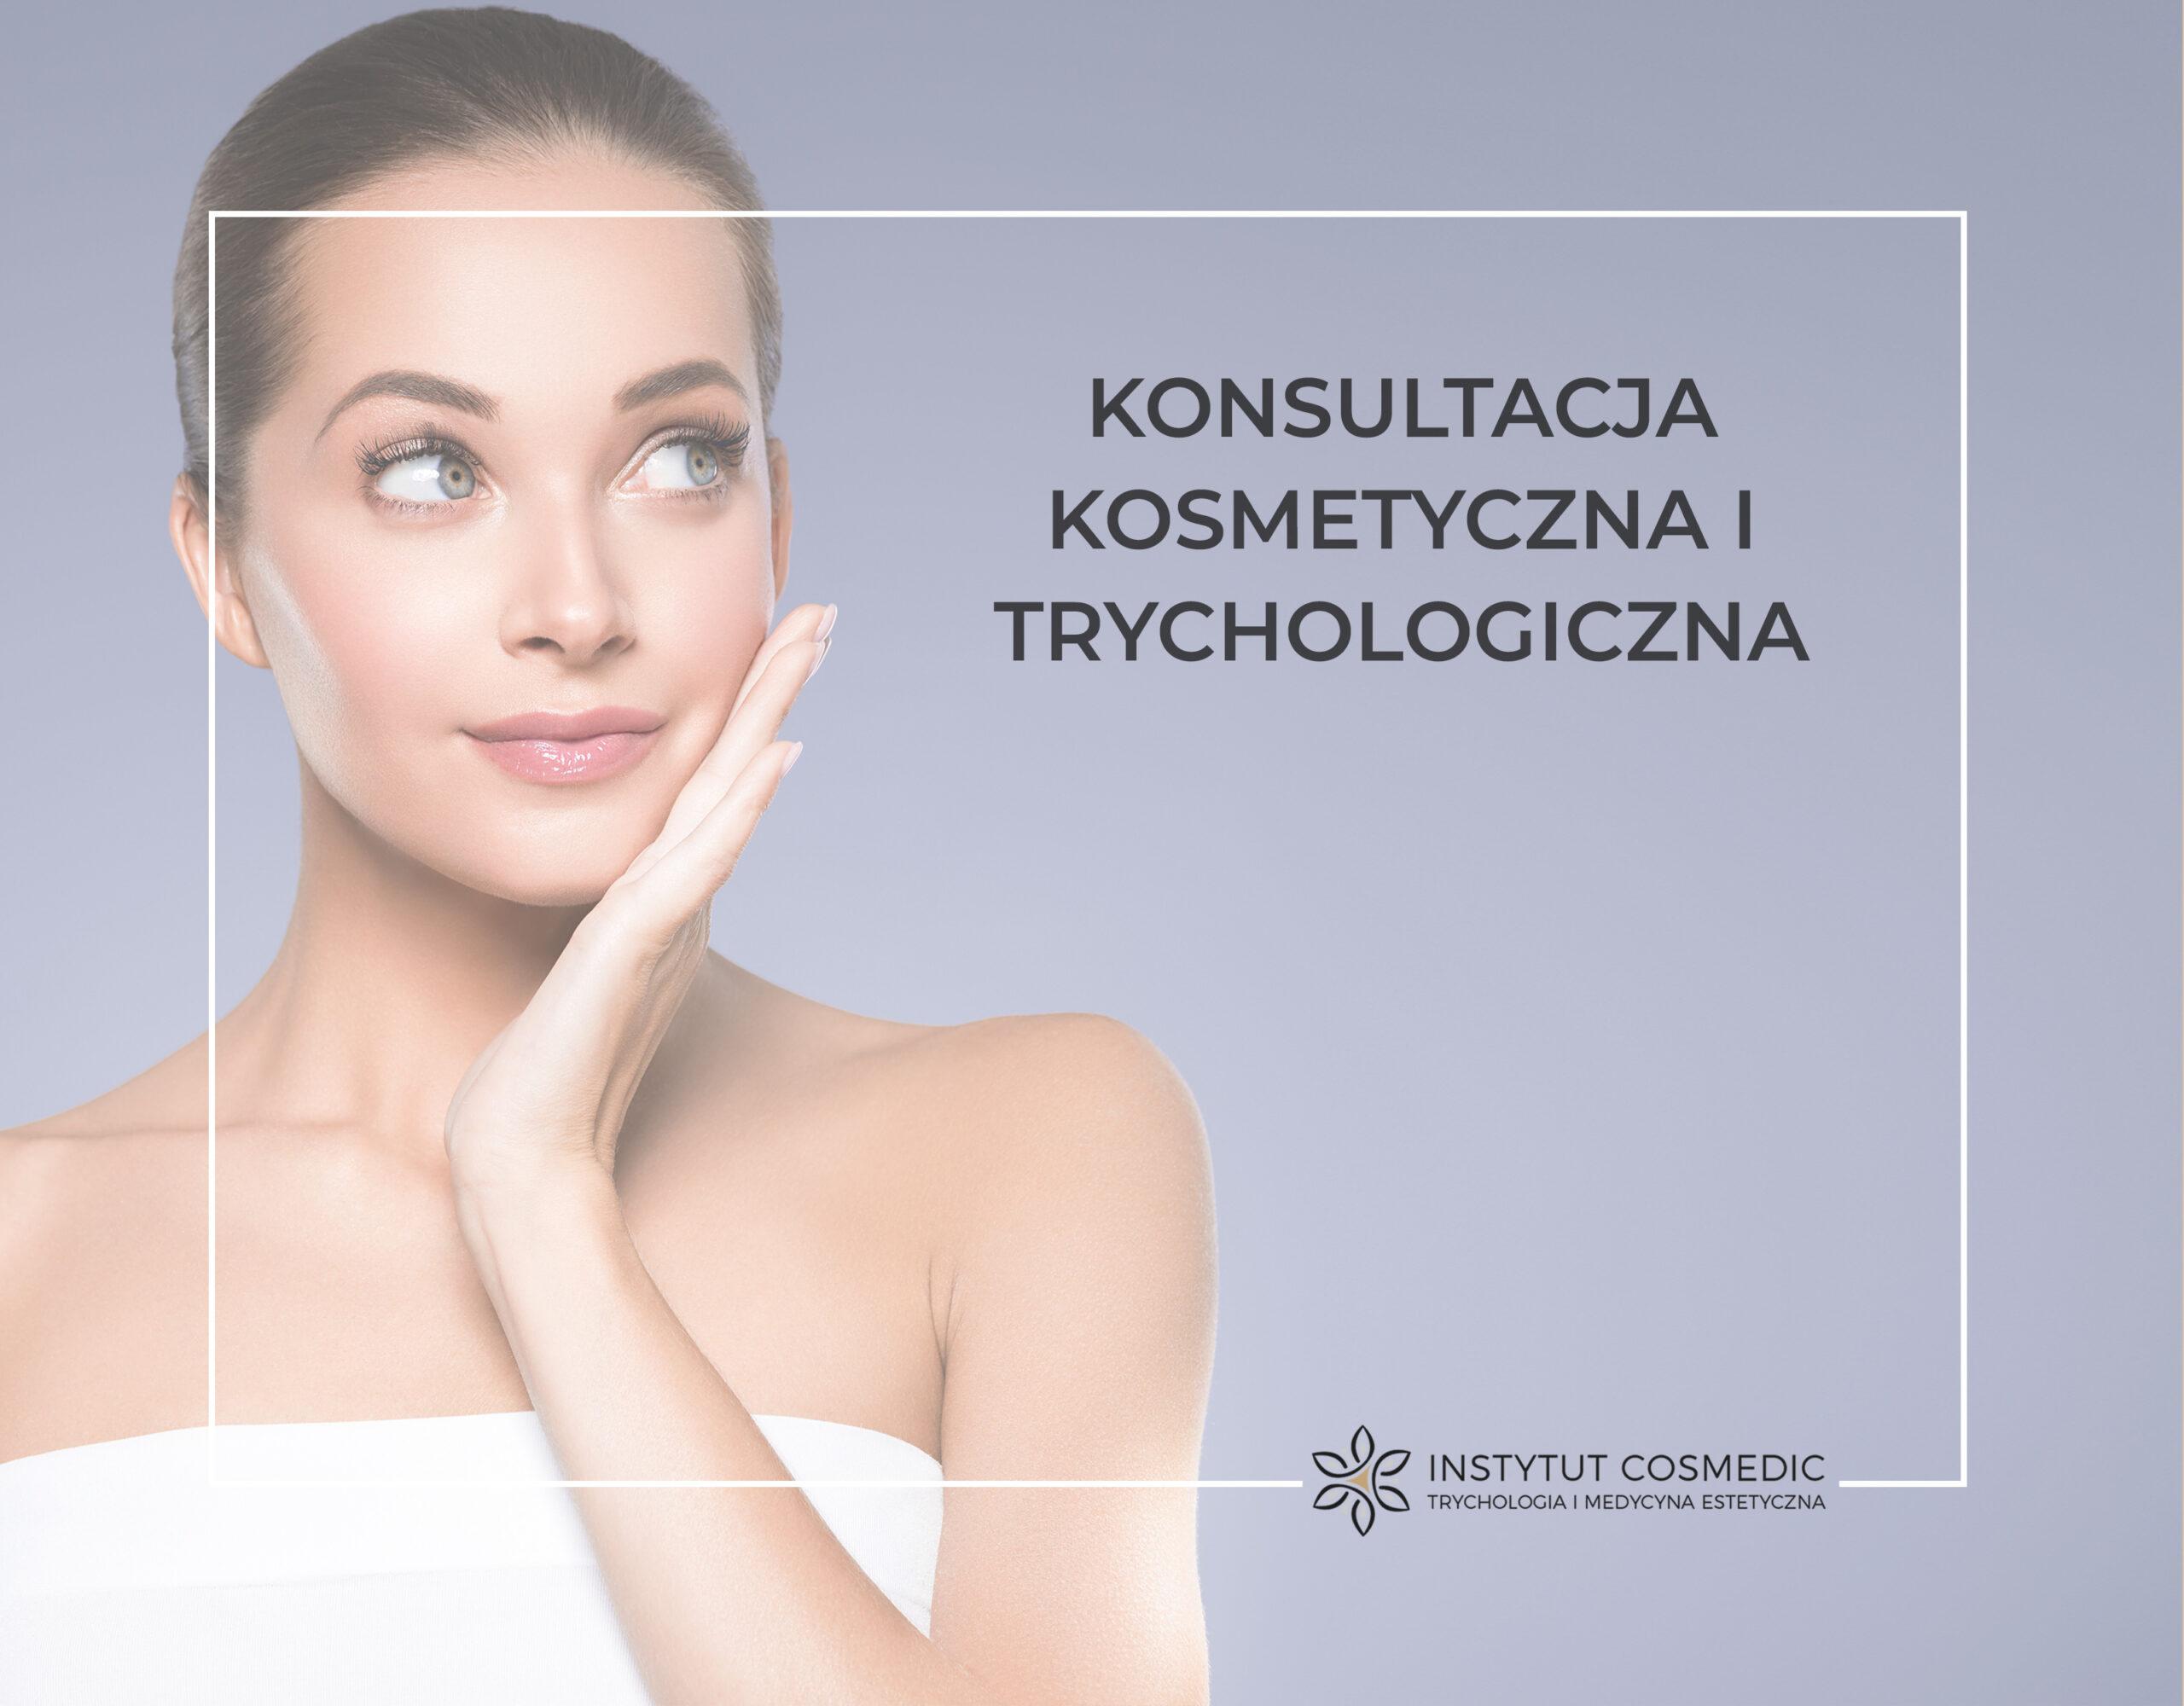 KonsultacKonsultacje kosmetyczne i trychologiczne - Instytutcosmedicje kosmetyczne i trychologiczne - Instytutcosmedic